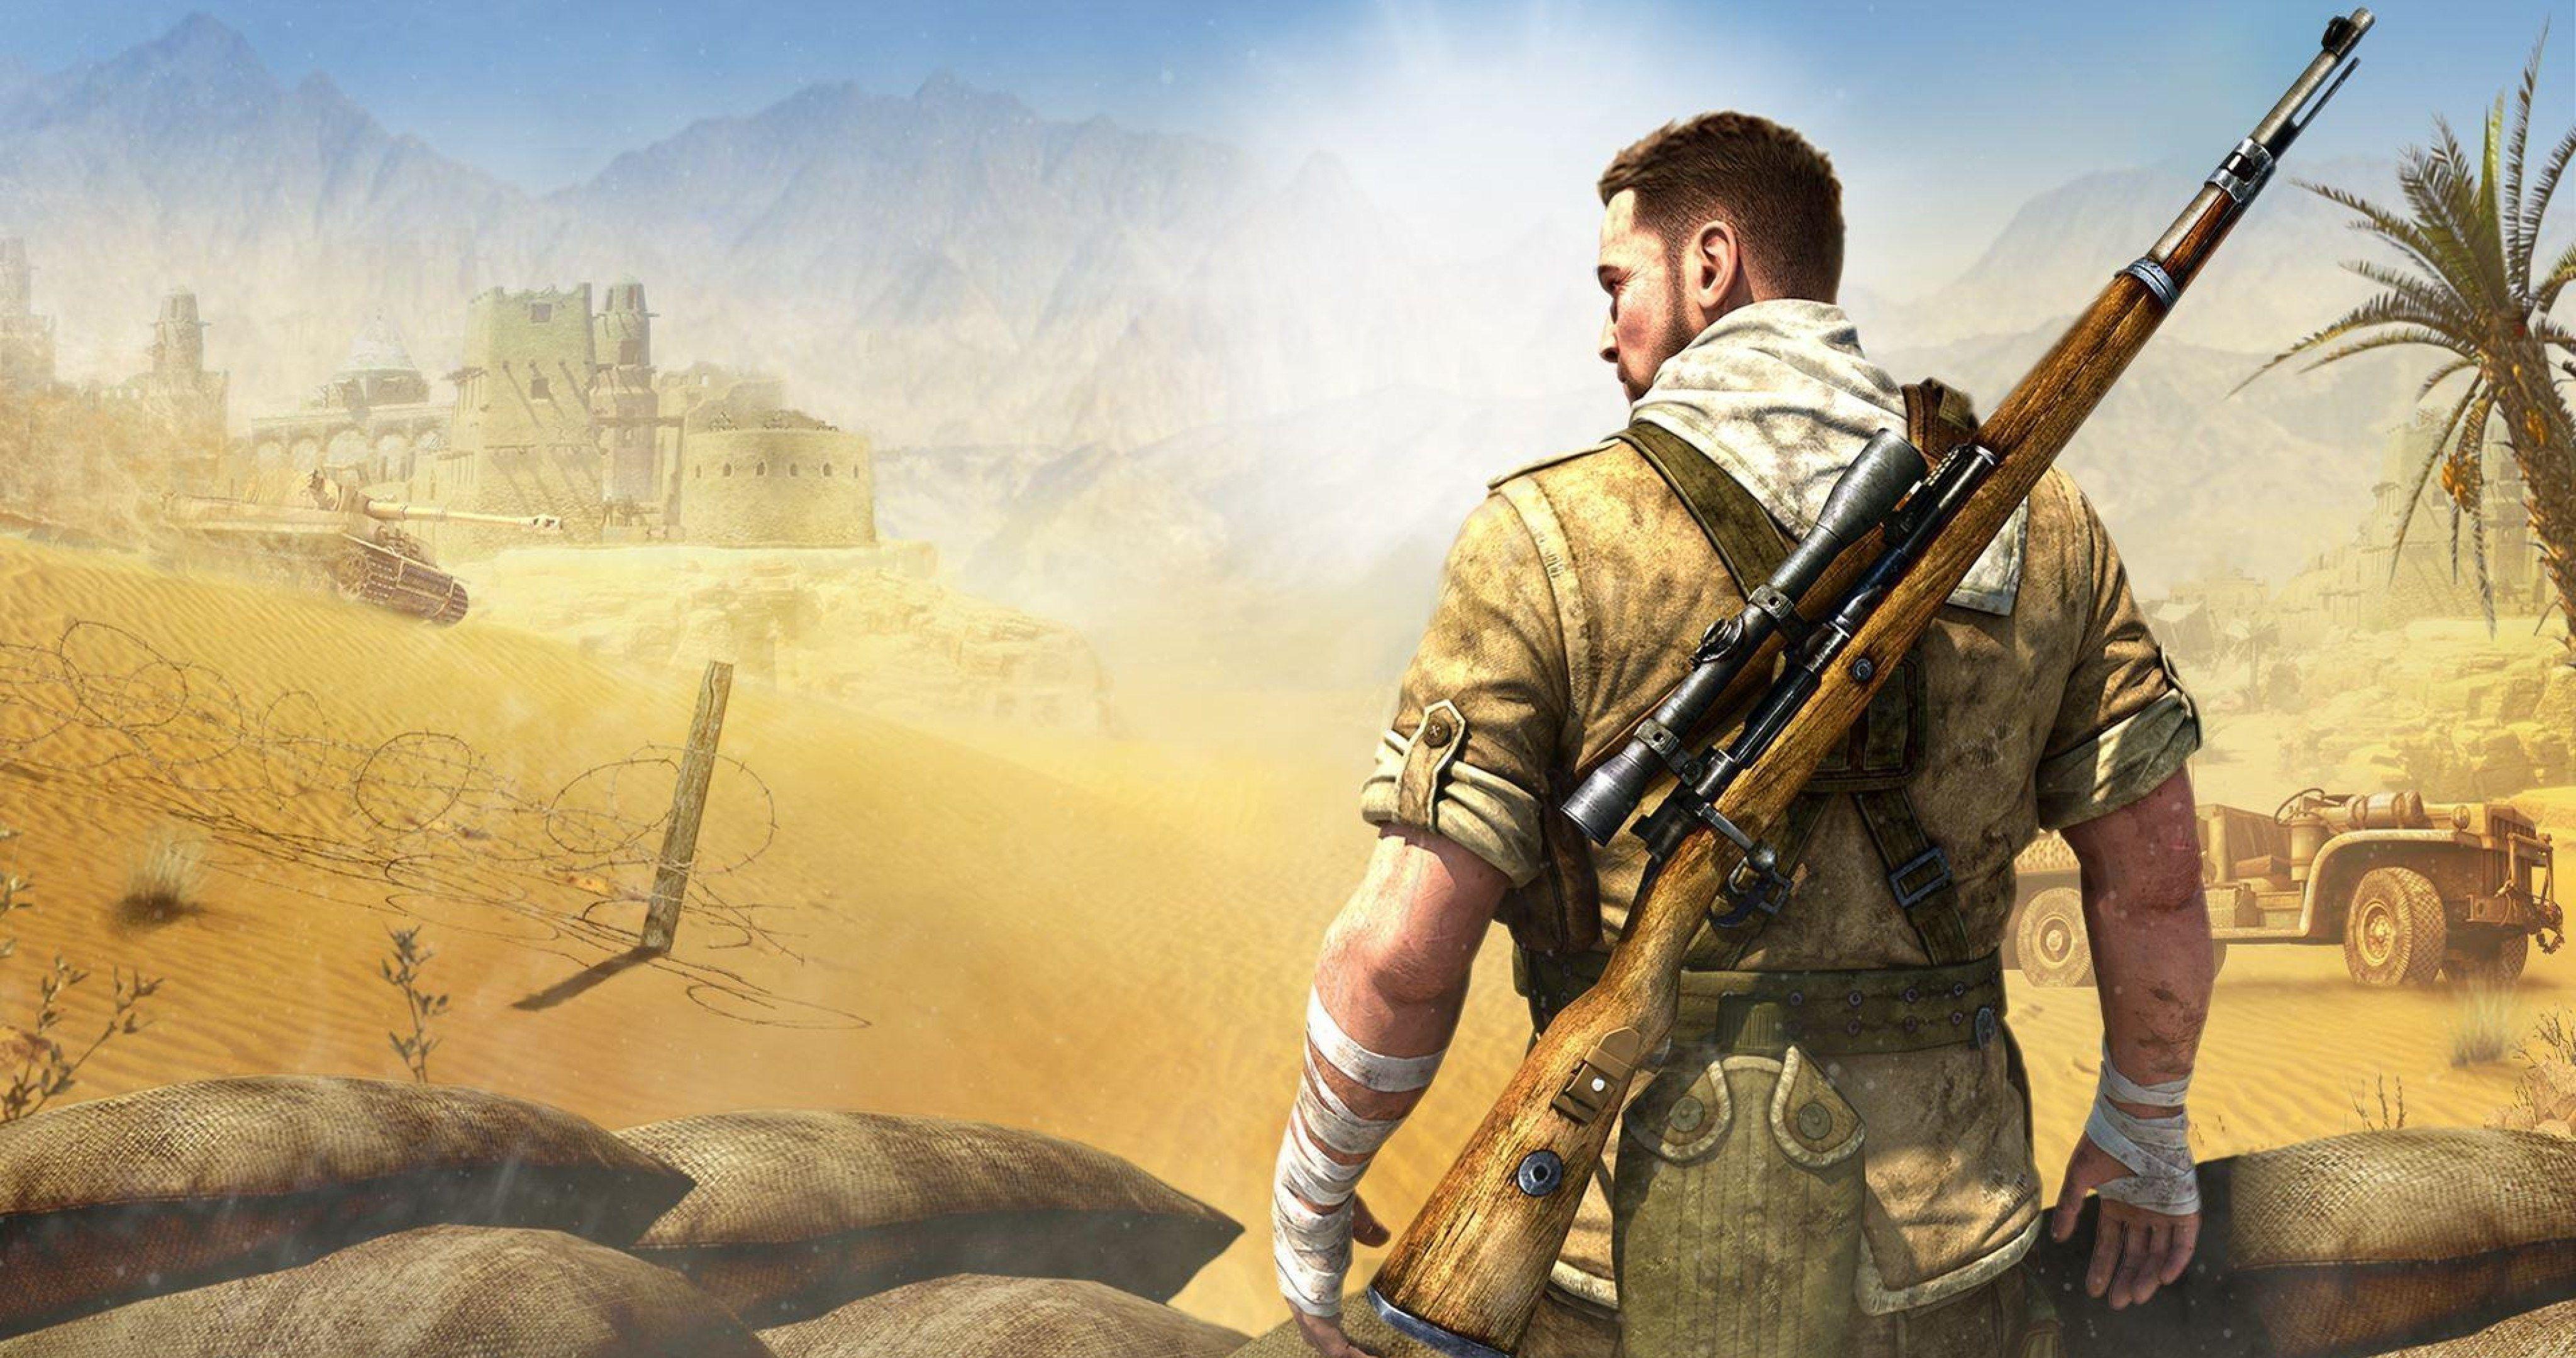 Sniper Elite 3 Video Game 4k Ultra Hd Wallpaper